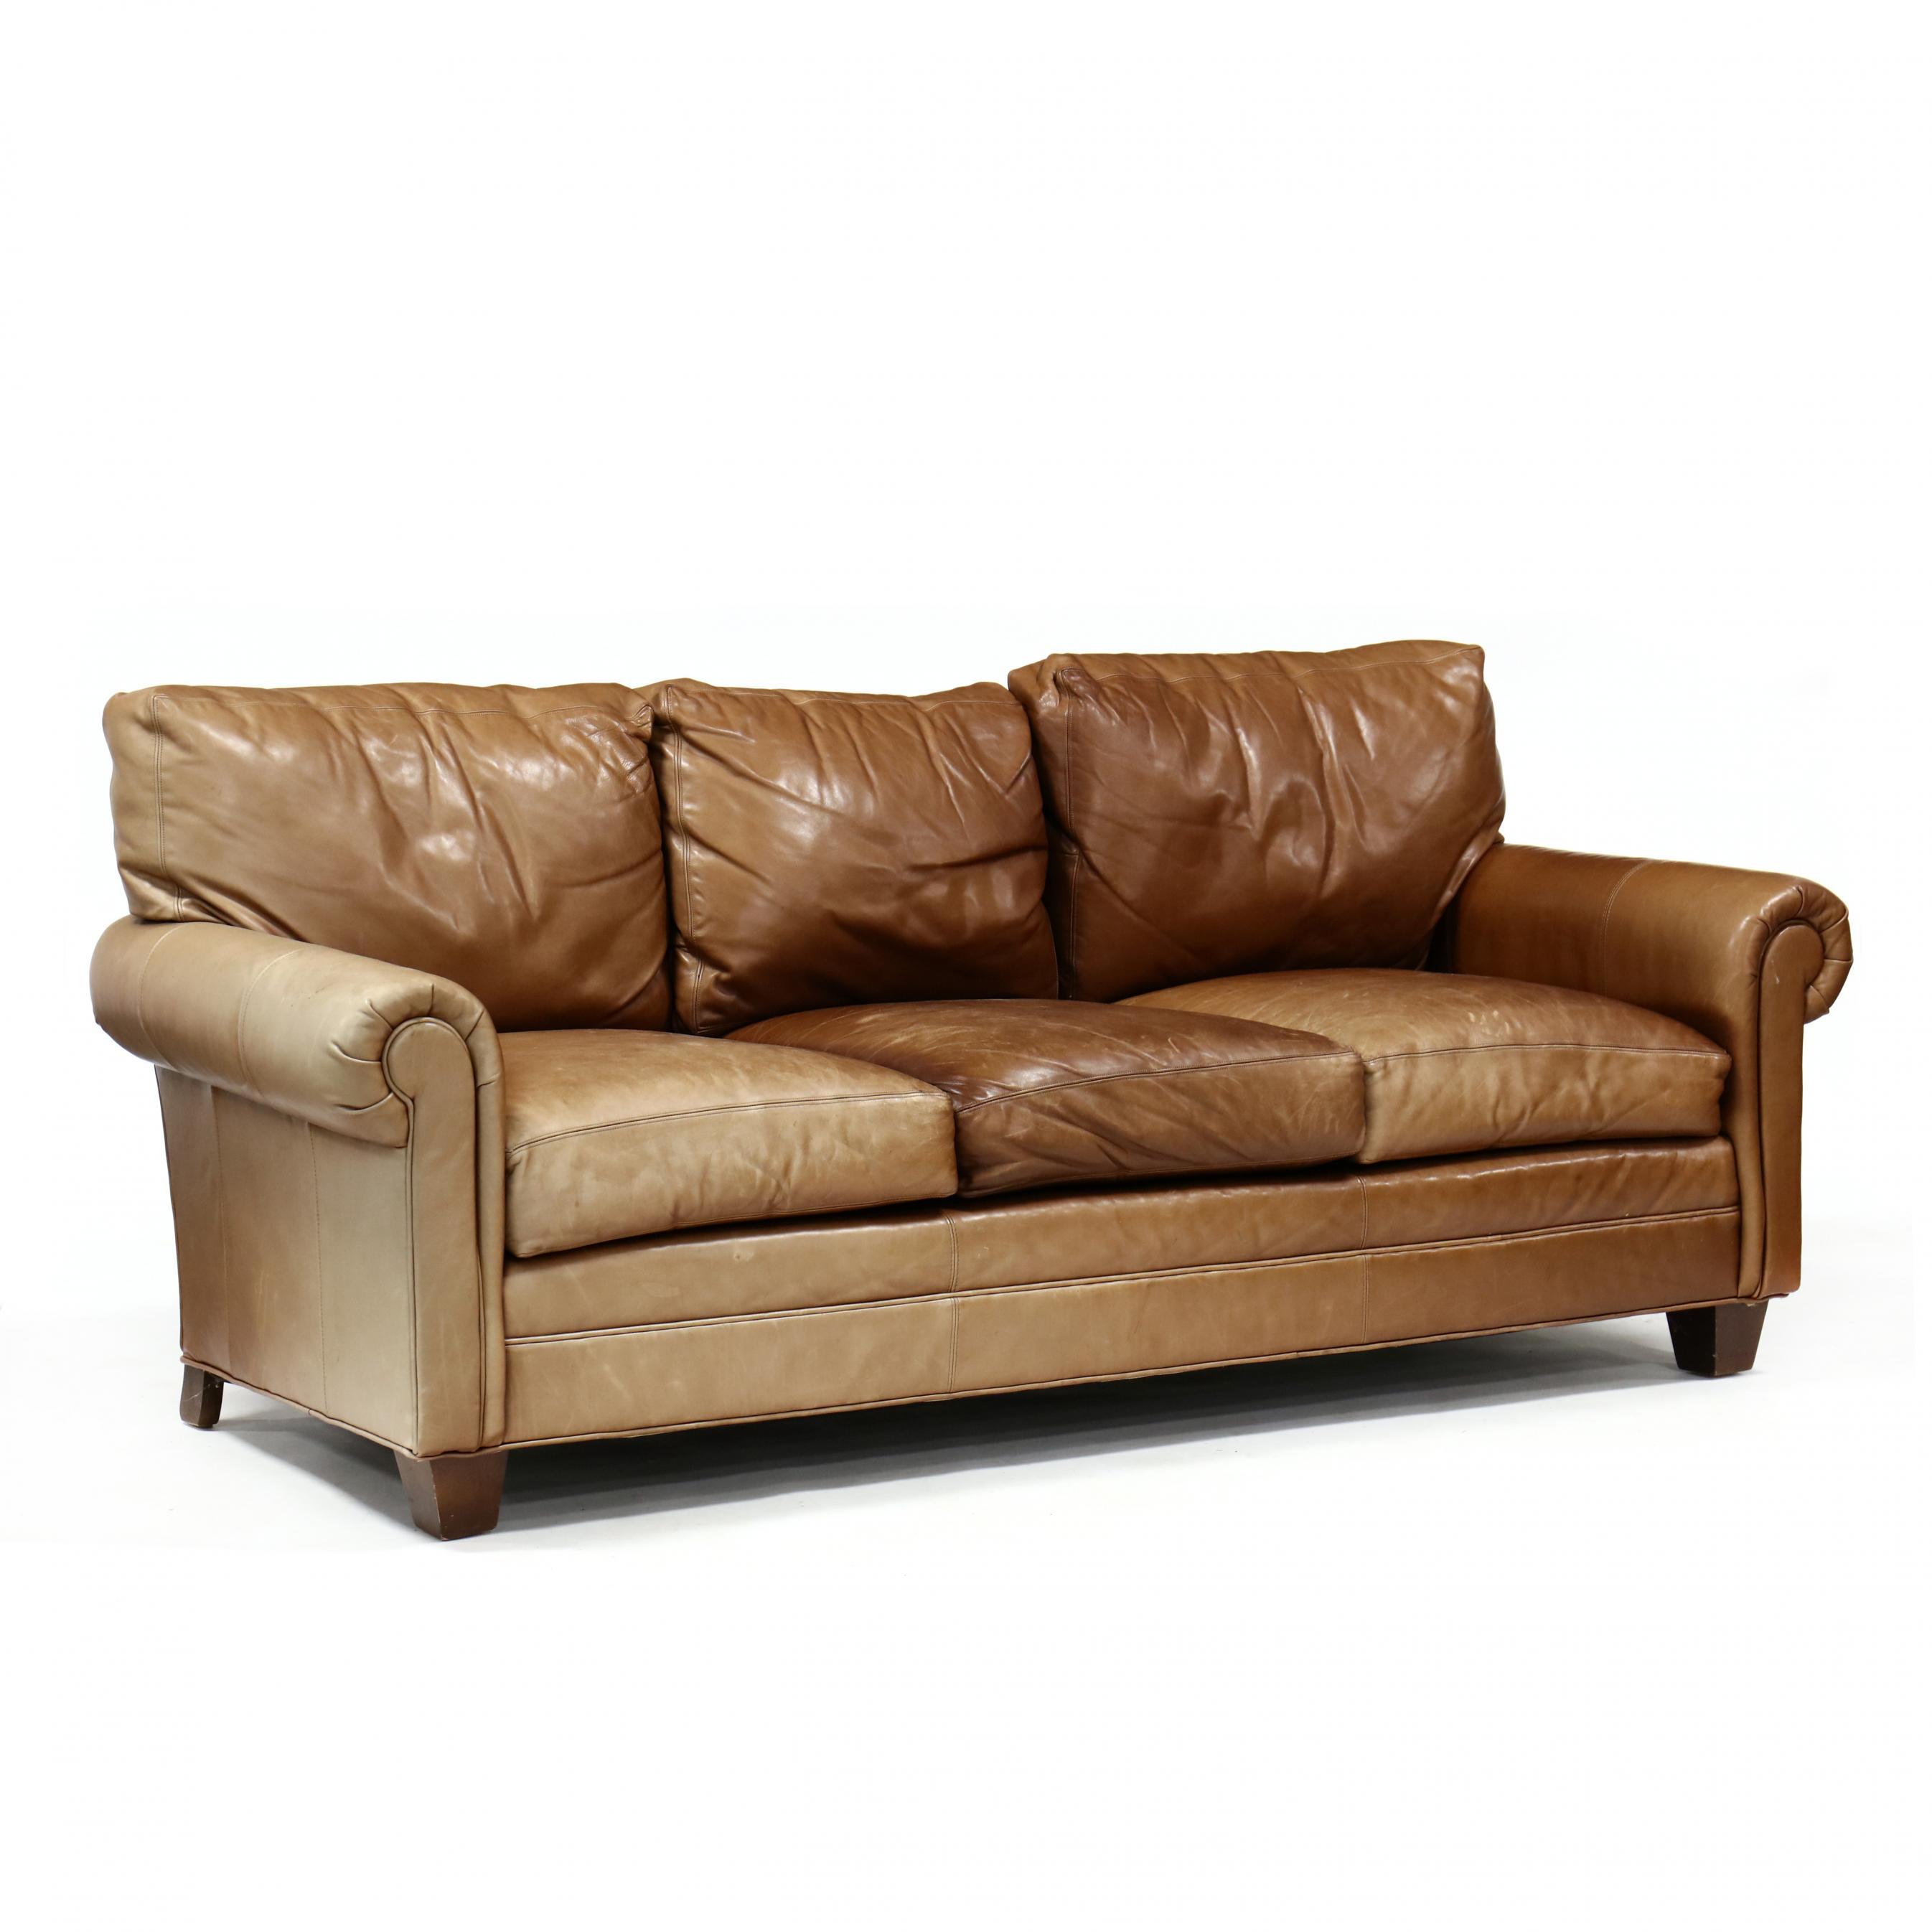 miles-talbott-contemporary-leather-sofa